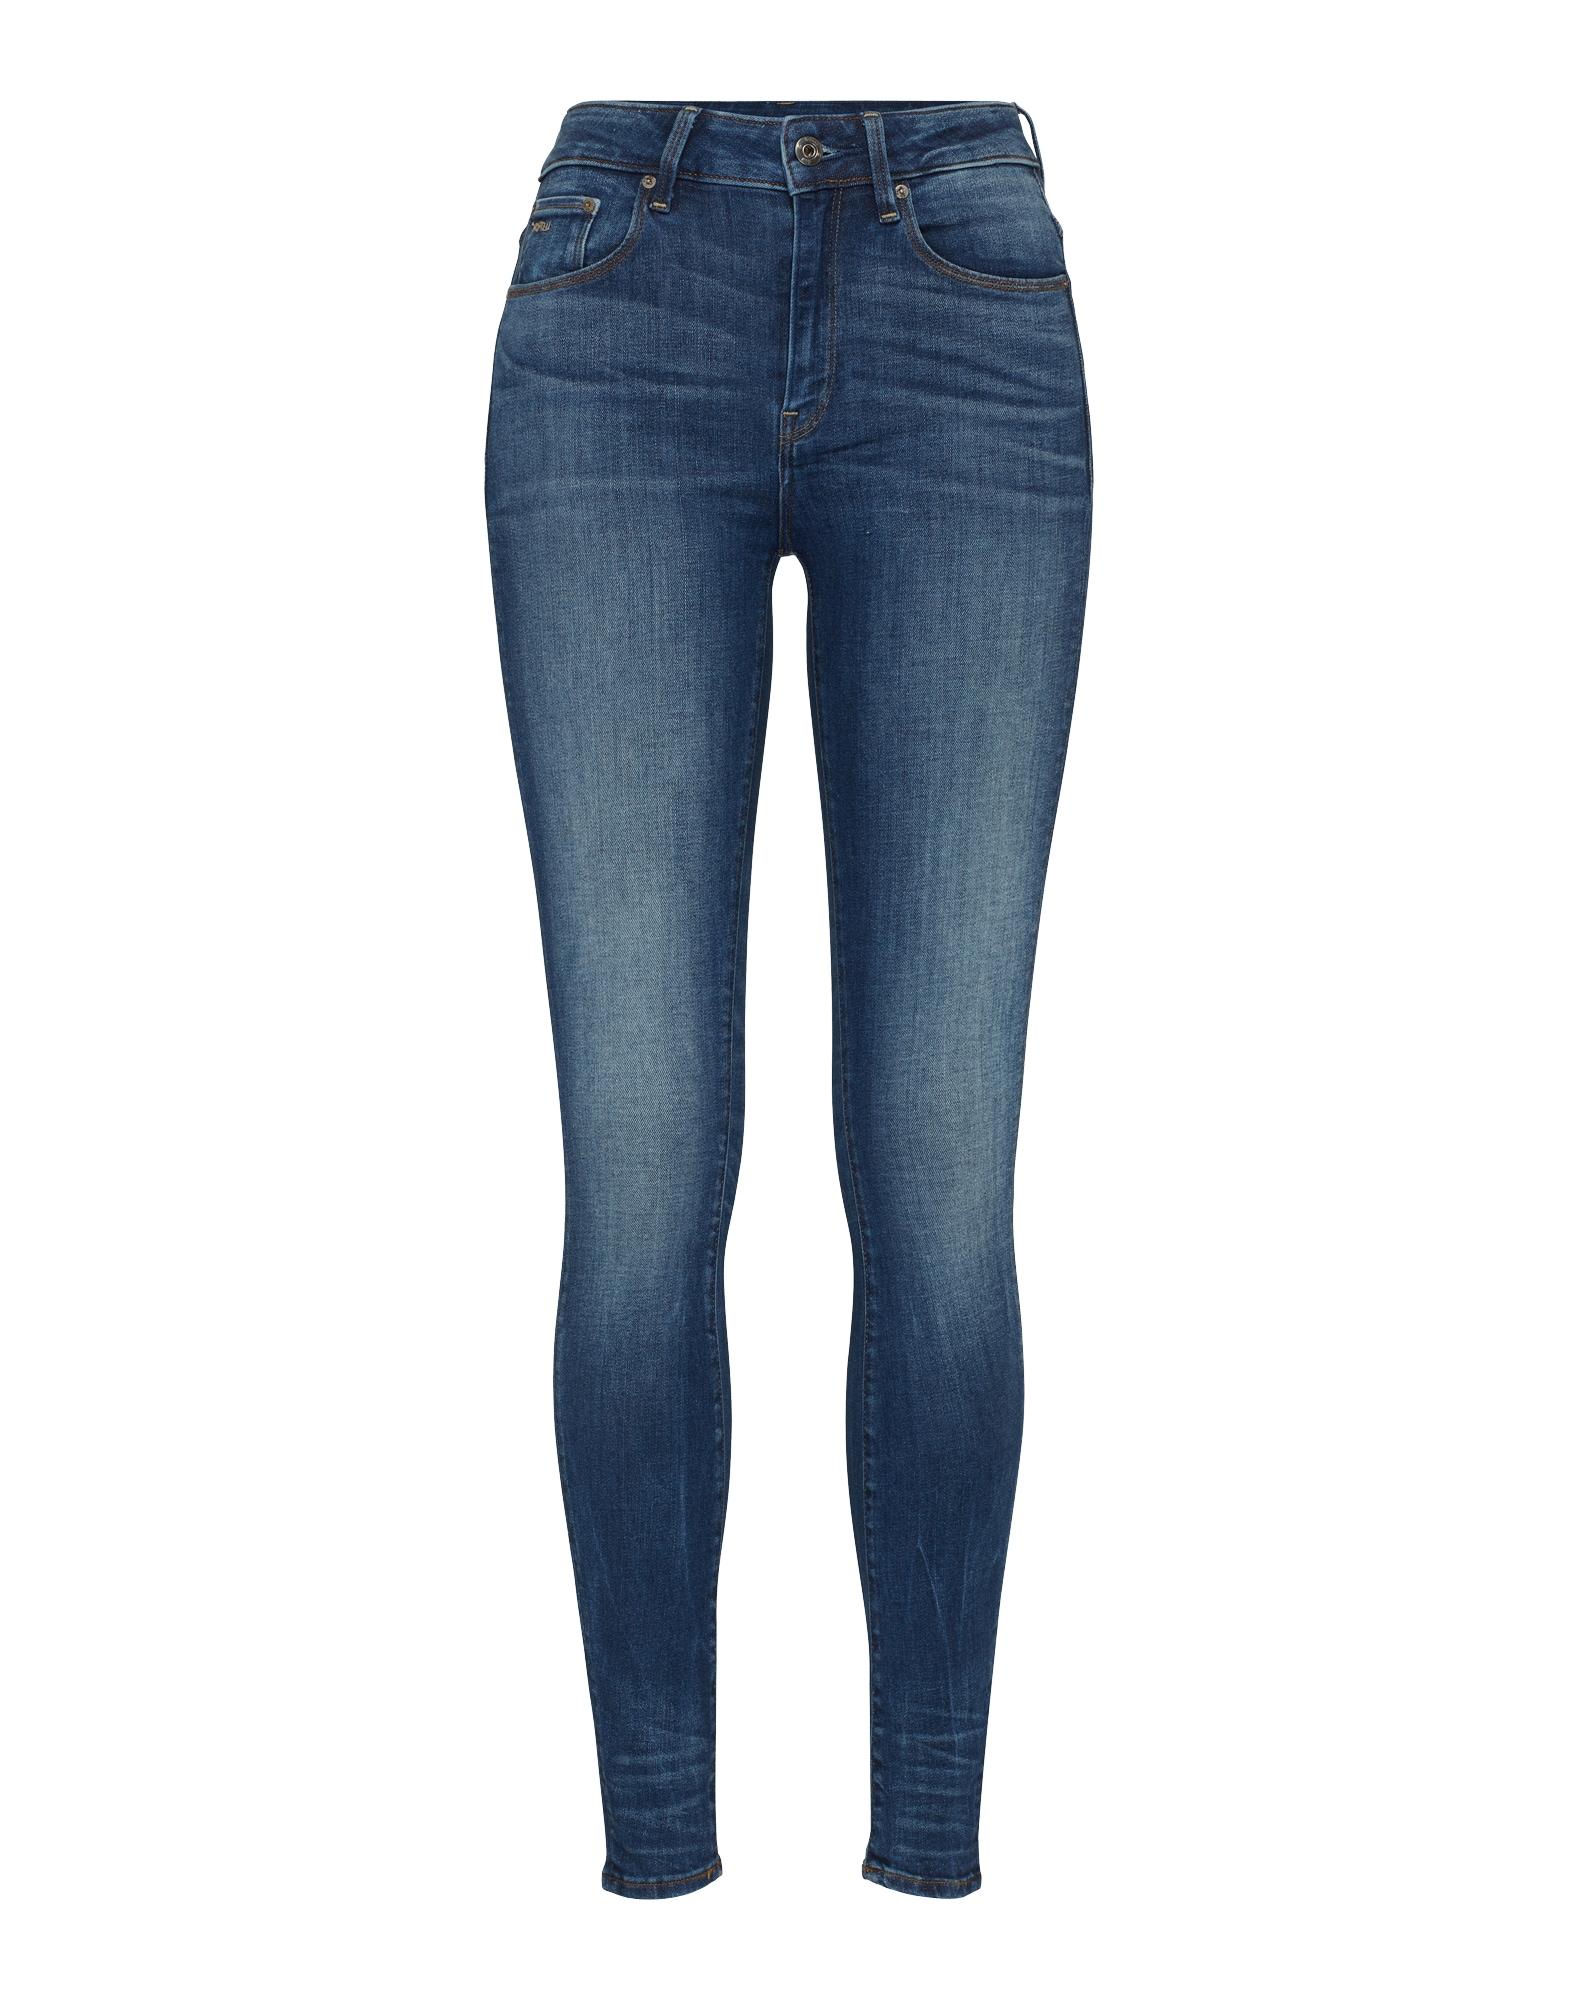 G-STAR RAW Dames Jeans 3301 High Skinny blue denim